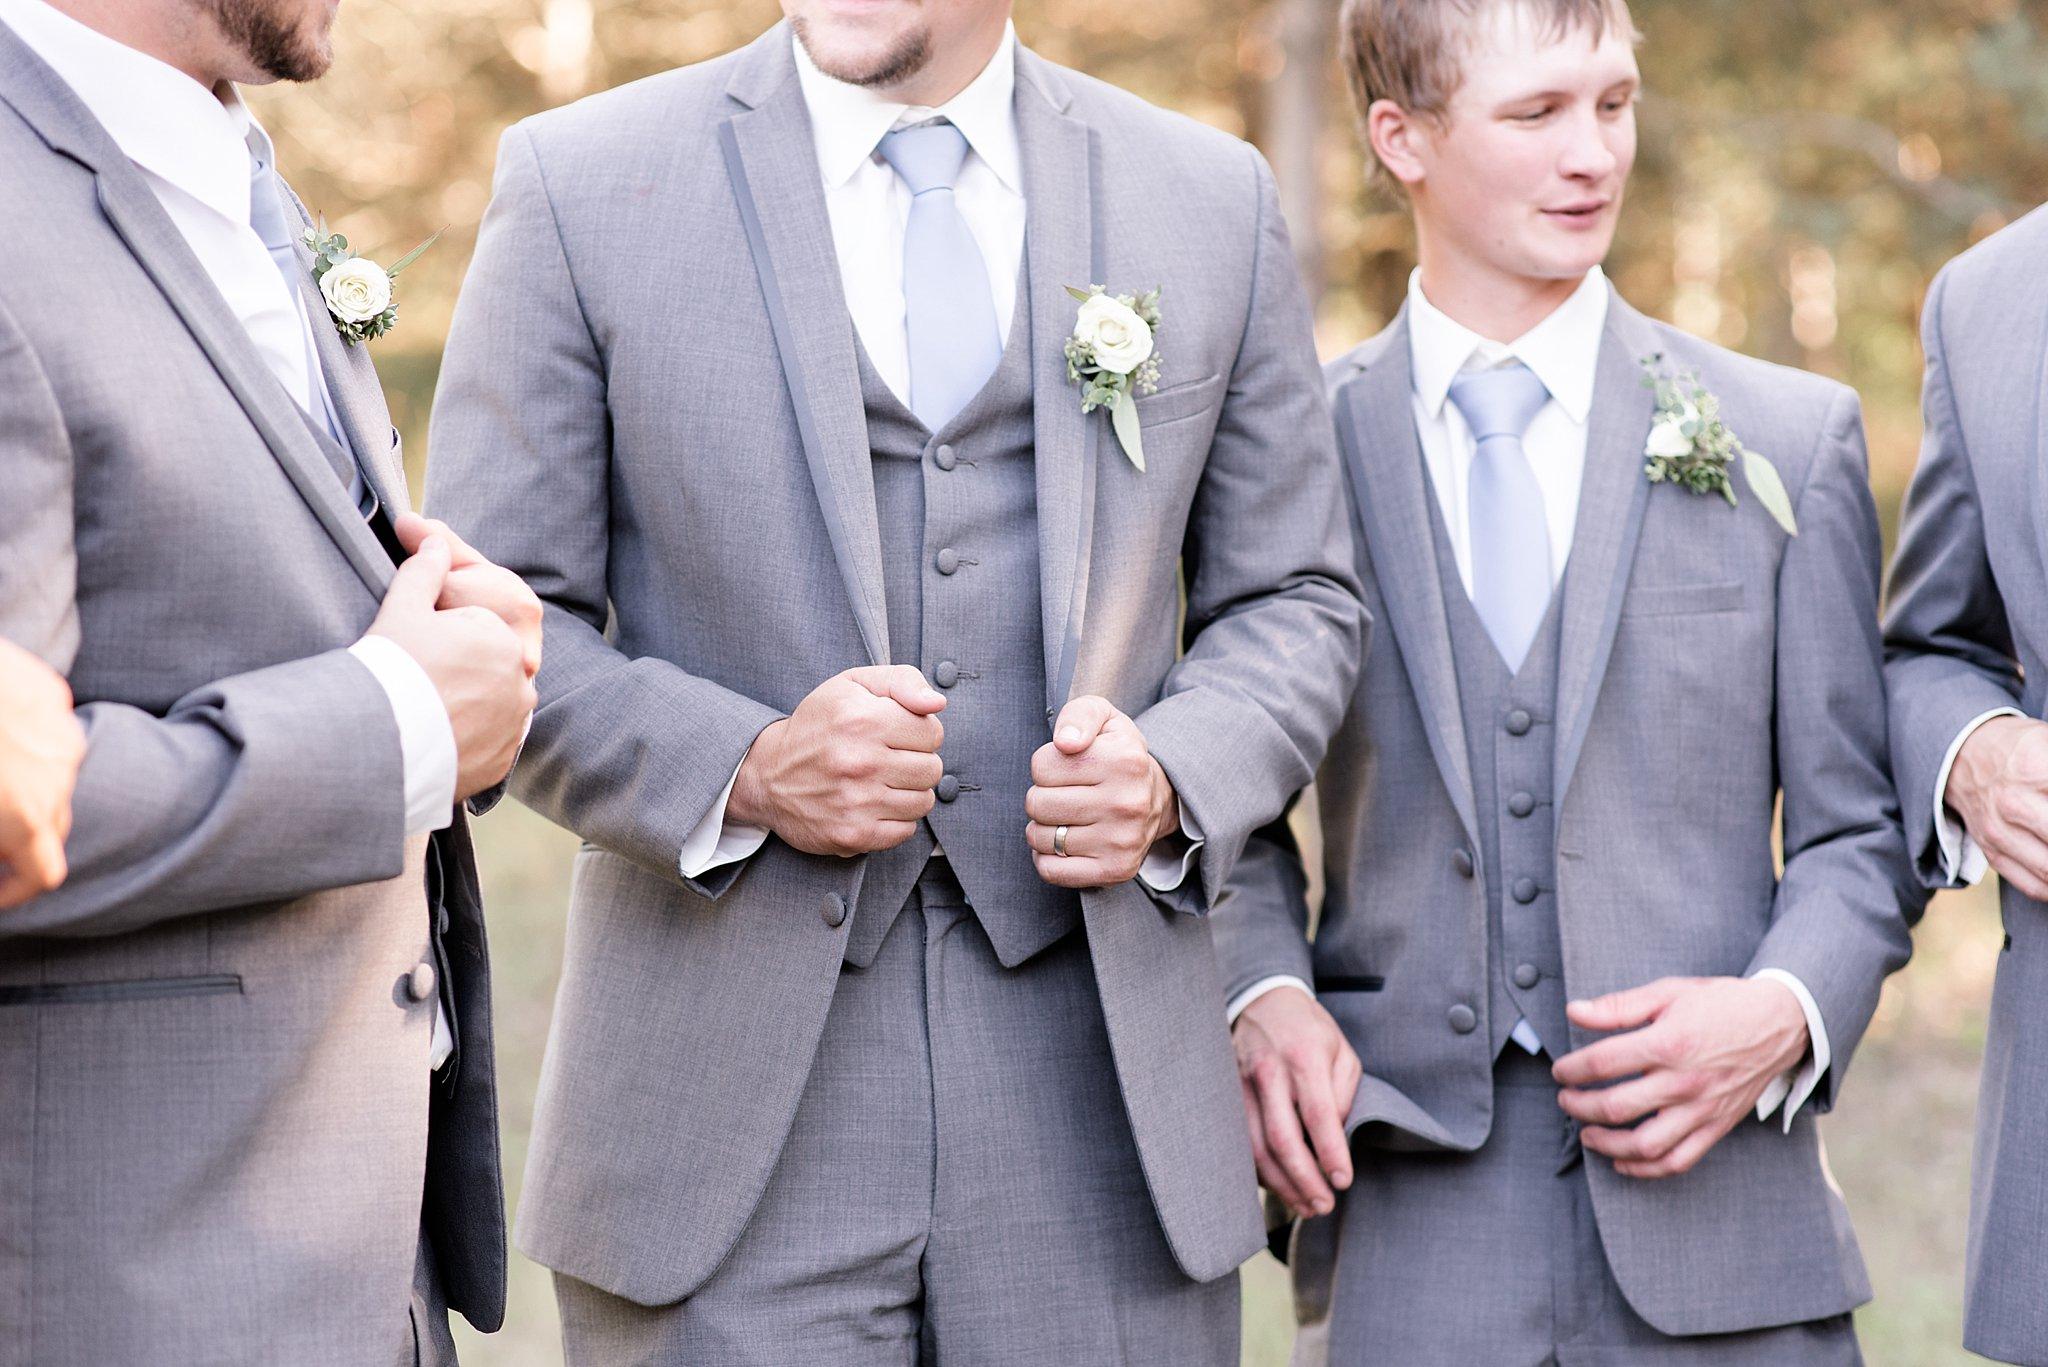 Cadillac-Michigan-wedding-caberfae-peaks-milwaukee-photographer_0045.jpg